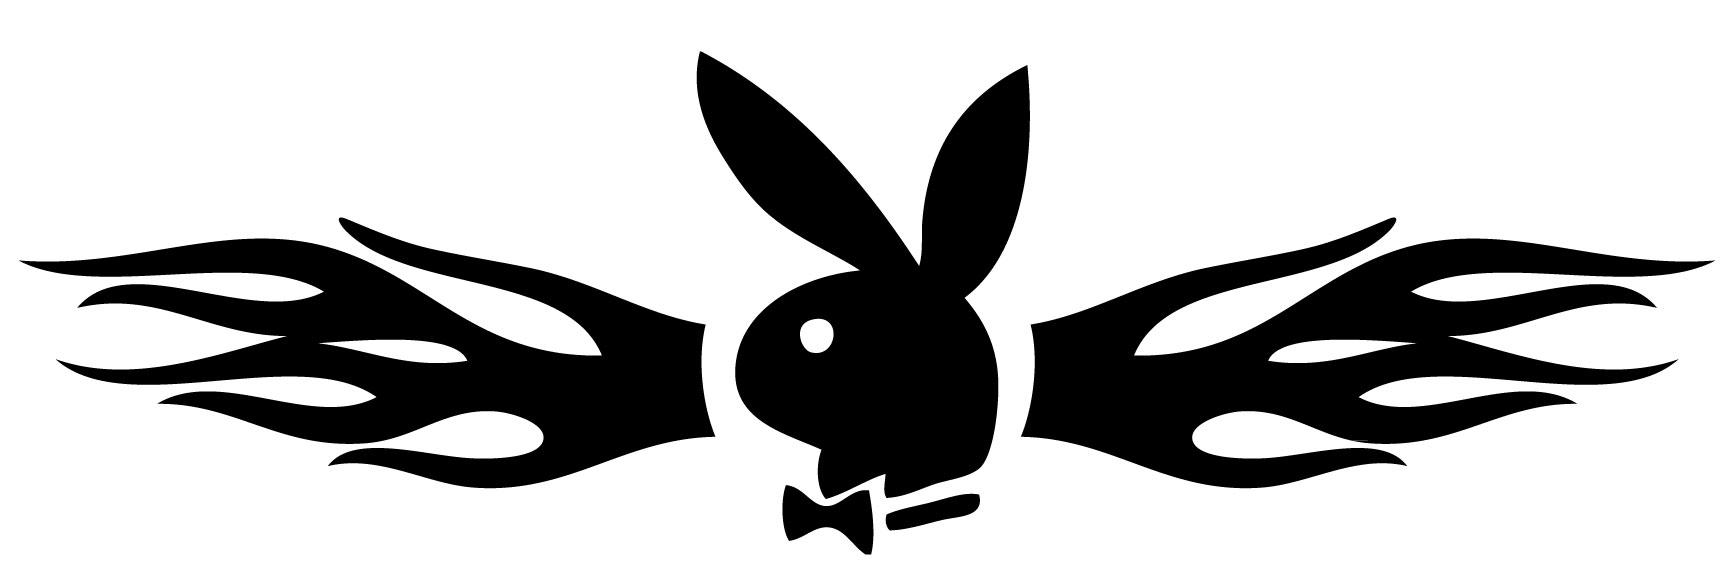 Flaming Playboy Bunny Sticker